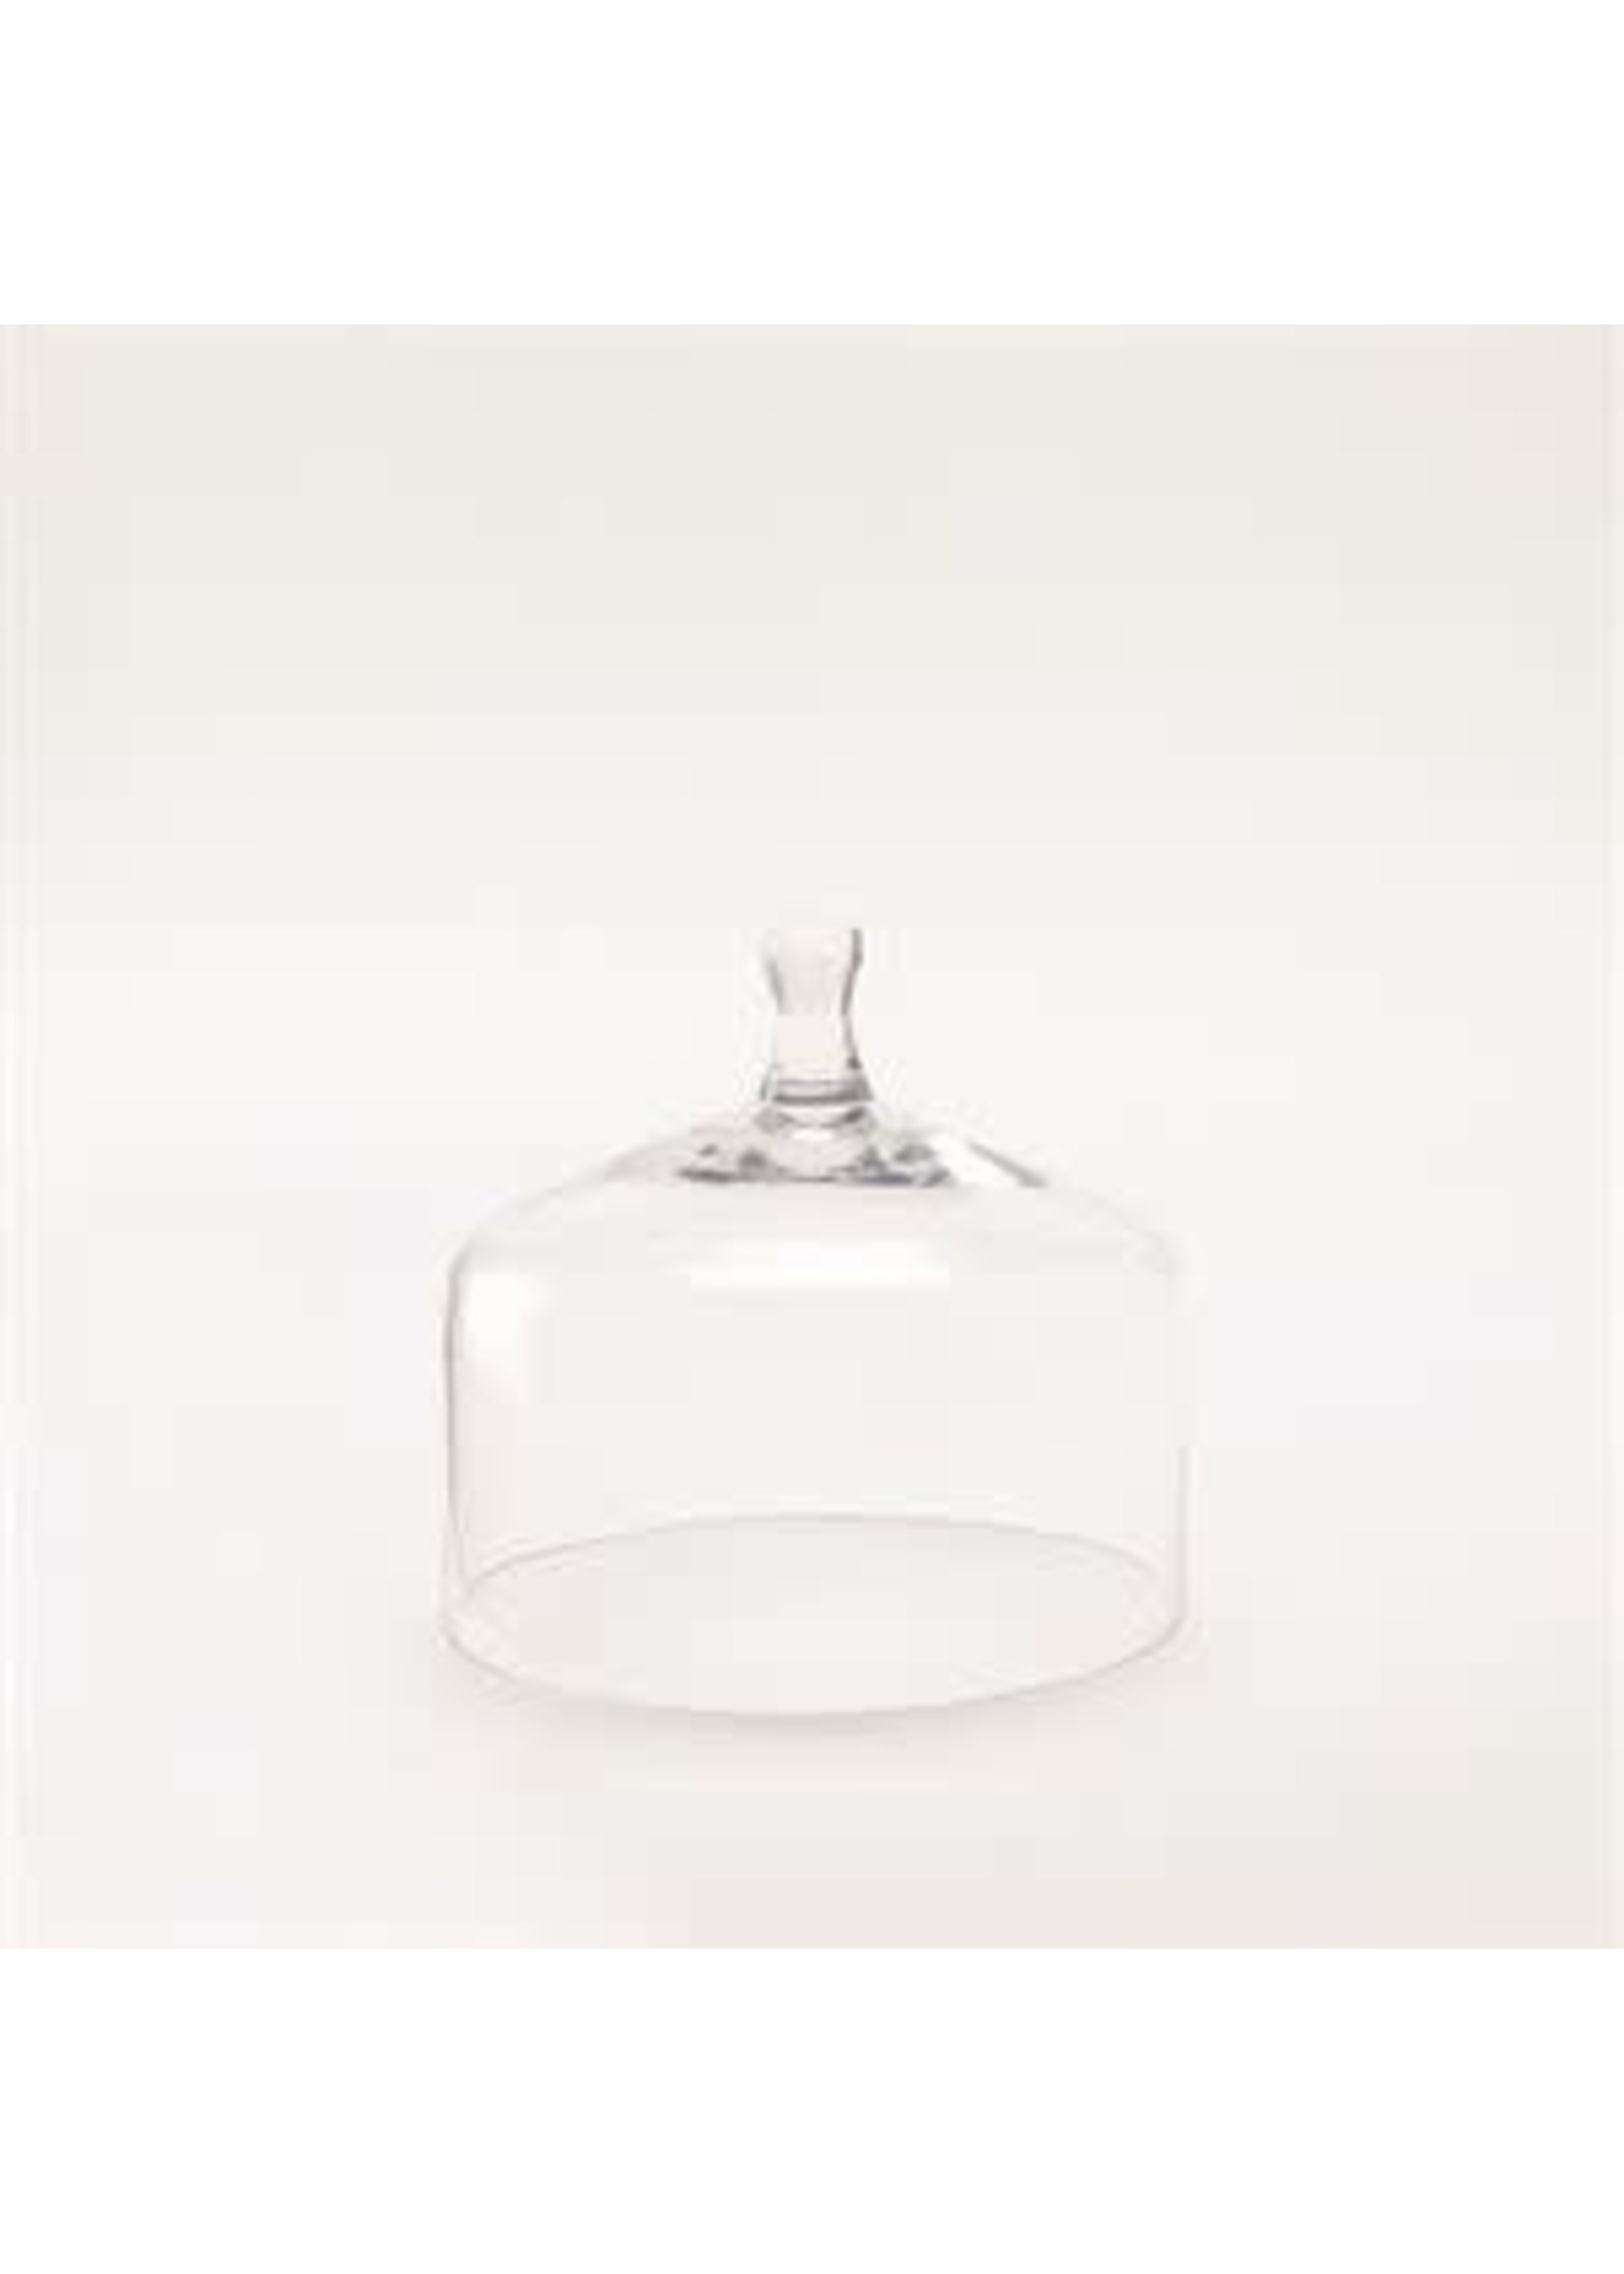 MEDIUM GLASS CLOCHE